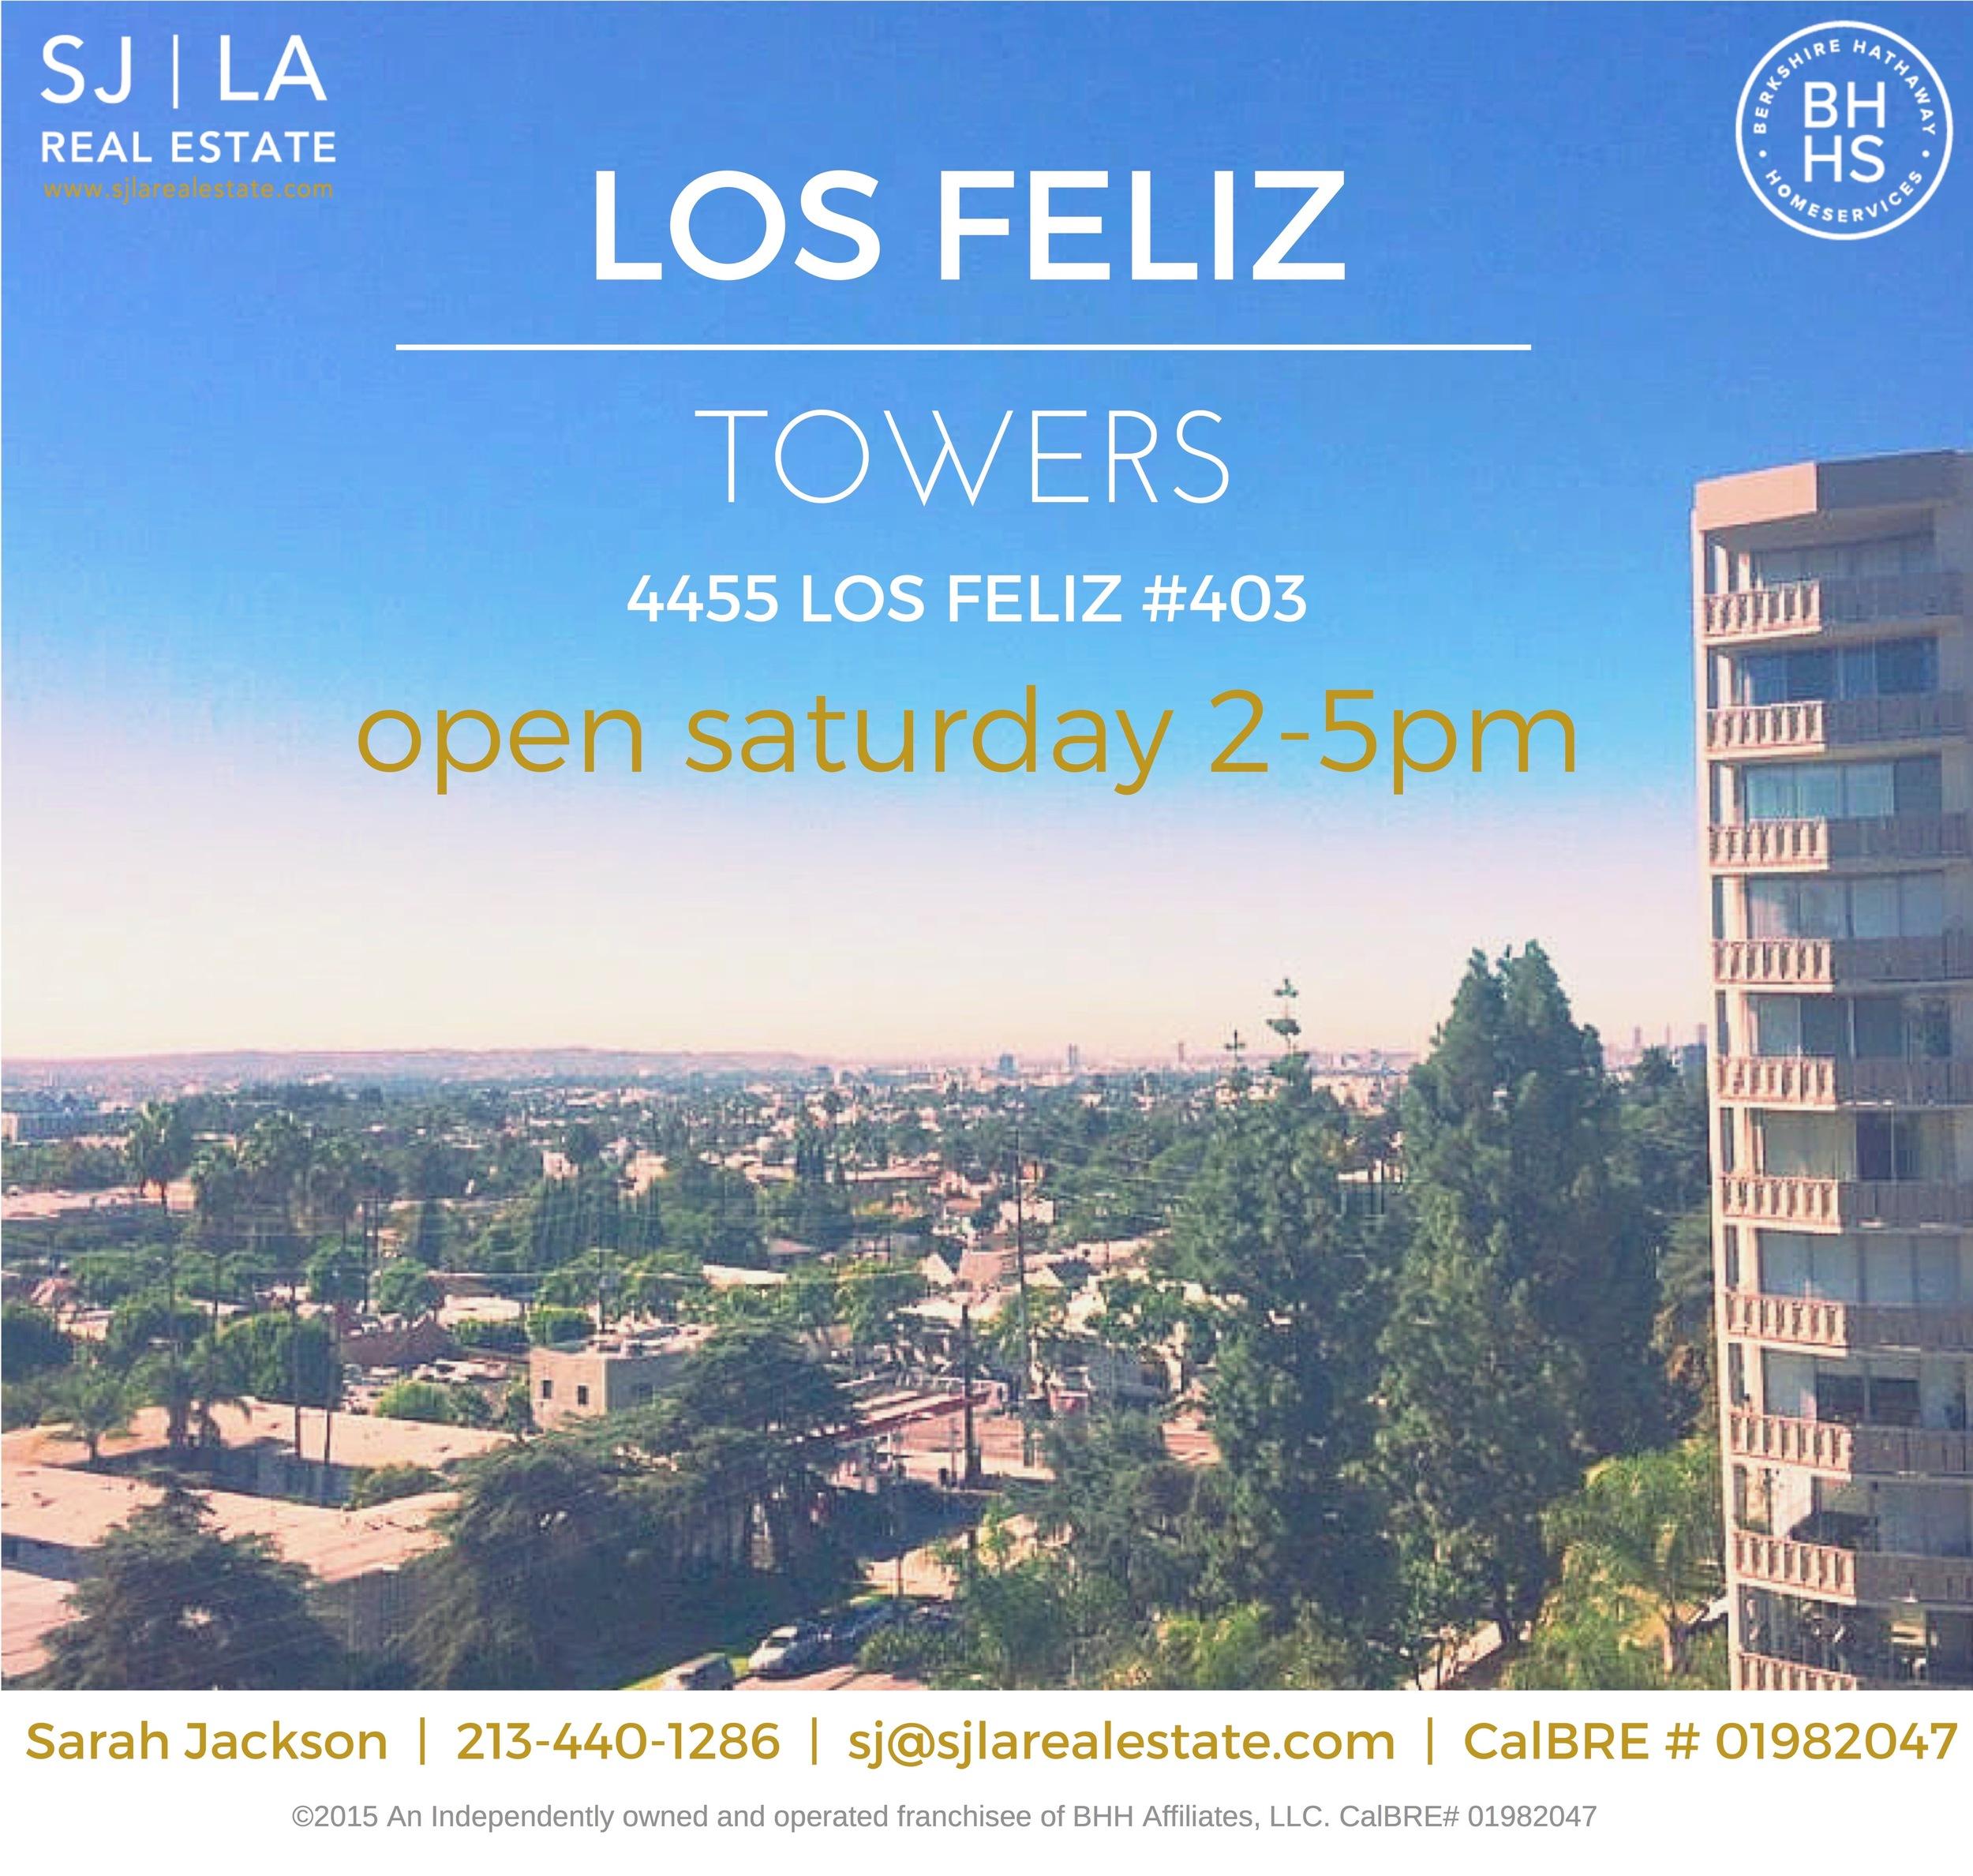 Los Feliz Towers